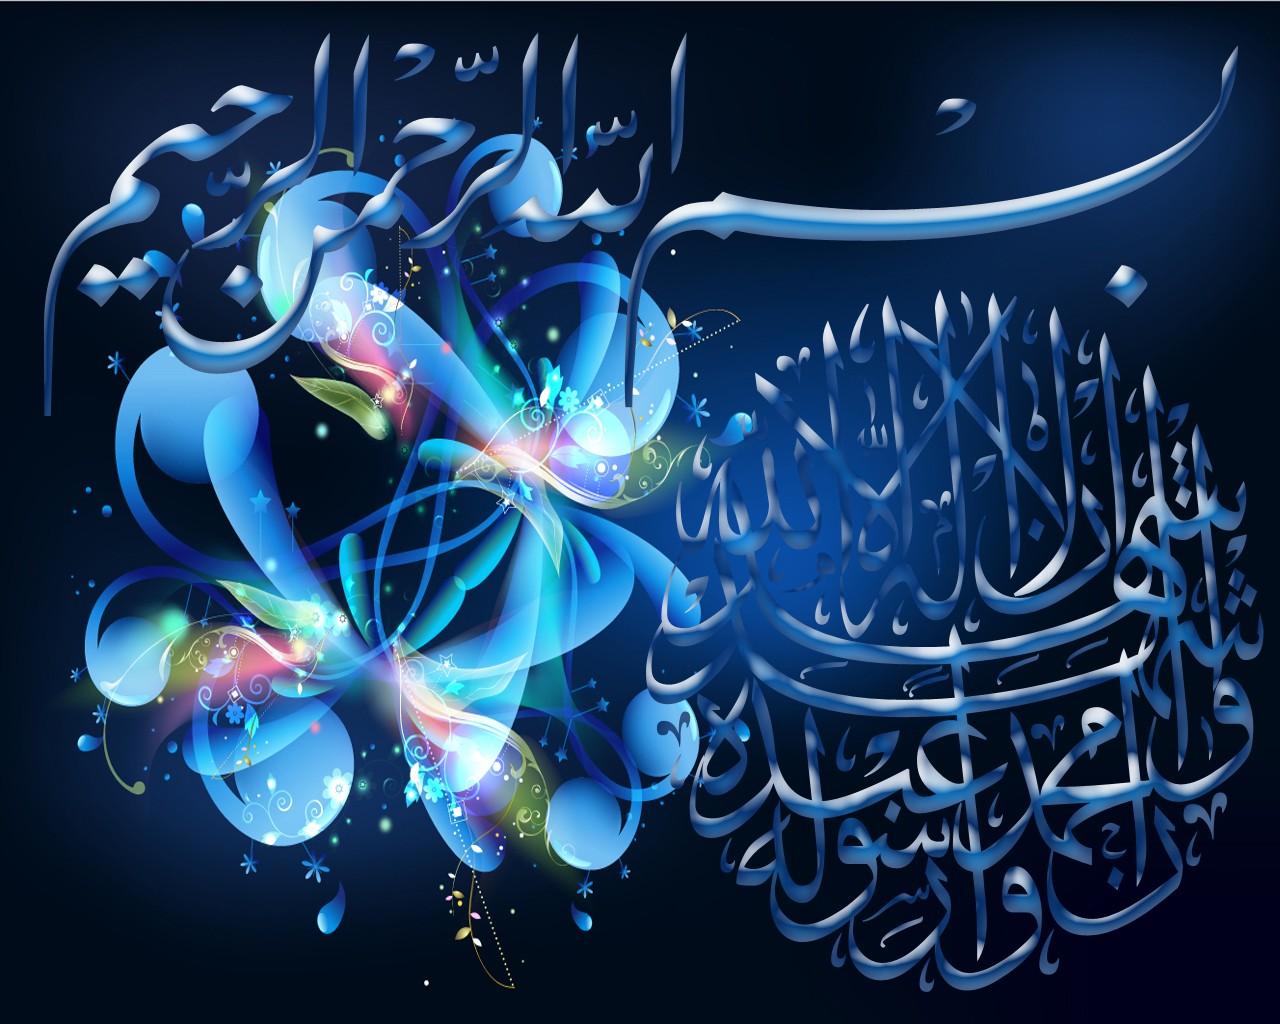 Wallpaper Lafadz Allah Bergerak vel